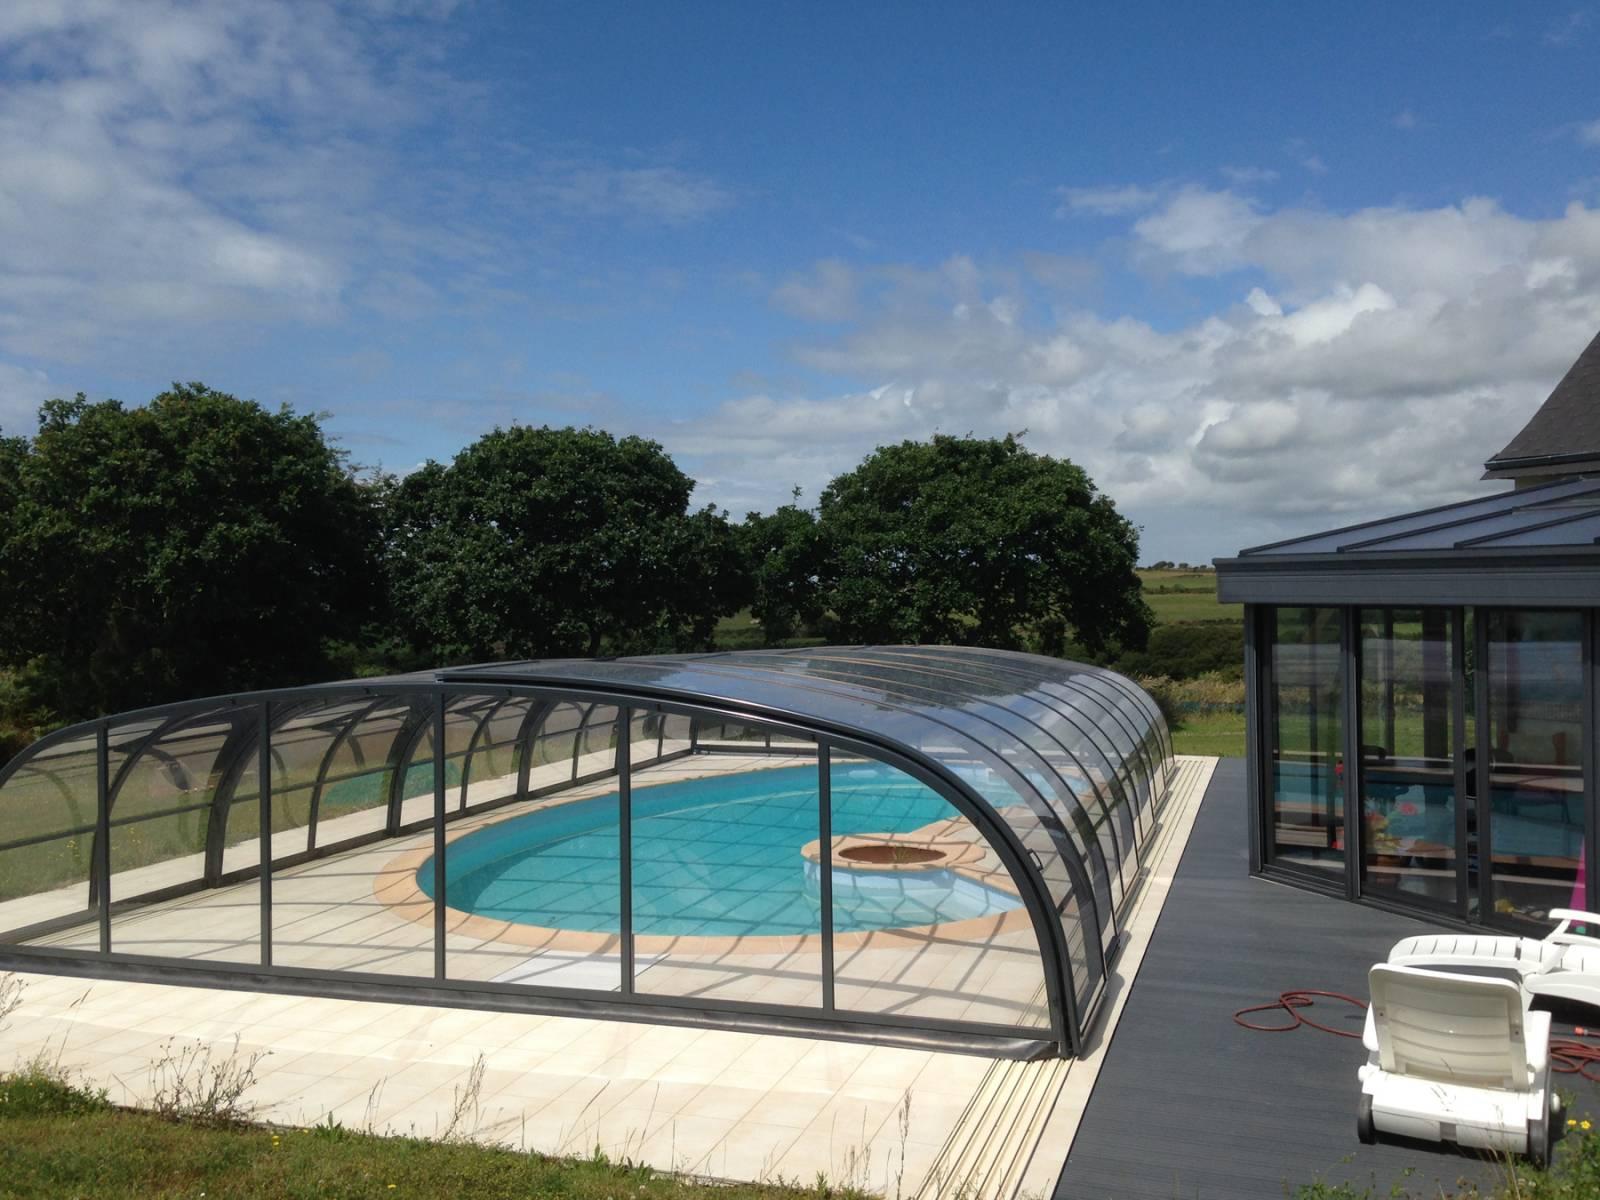 Abri de piscine abrinoval vente de mat riel de piscine for Materiel de piscine